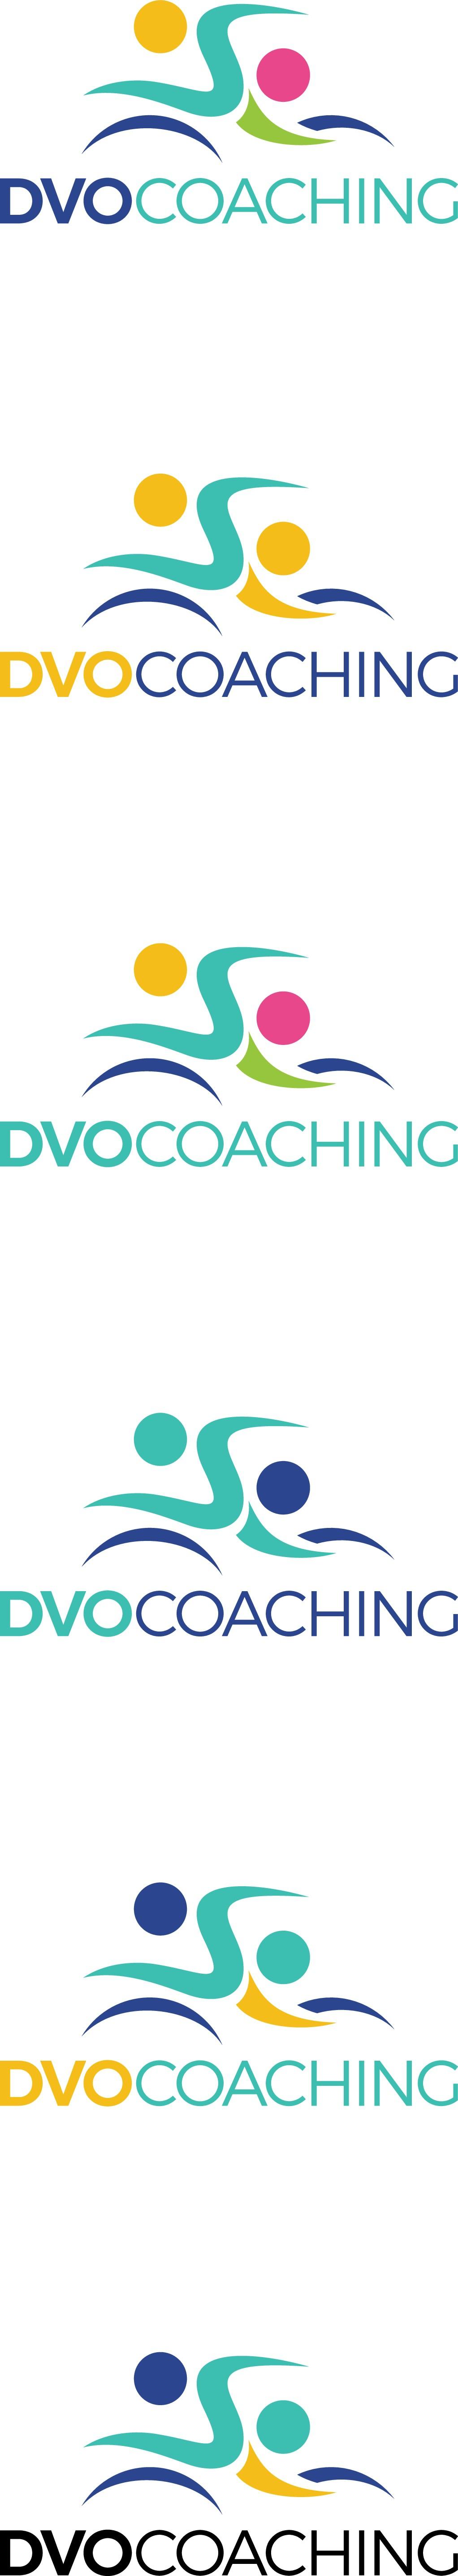 Swim, bike, run. Design a cool logo for a triathlon coach